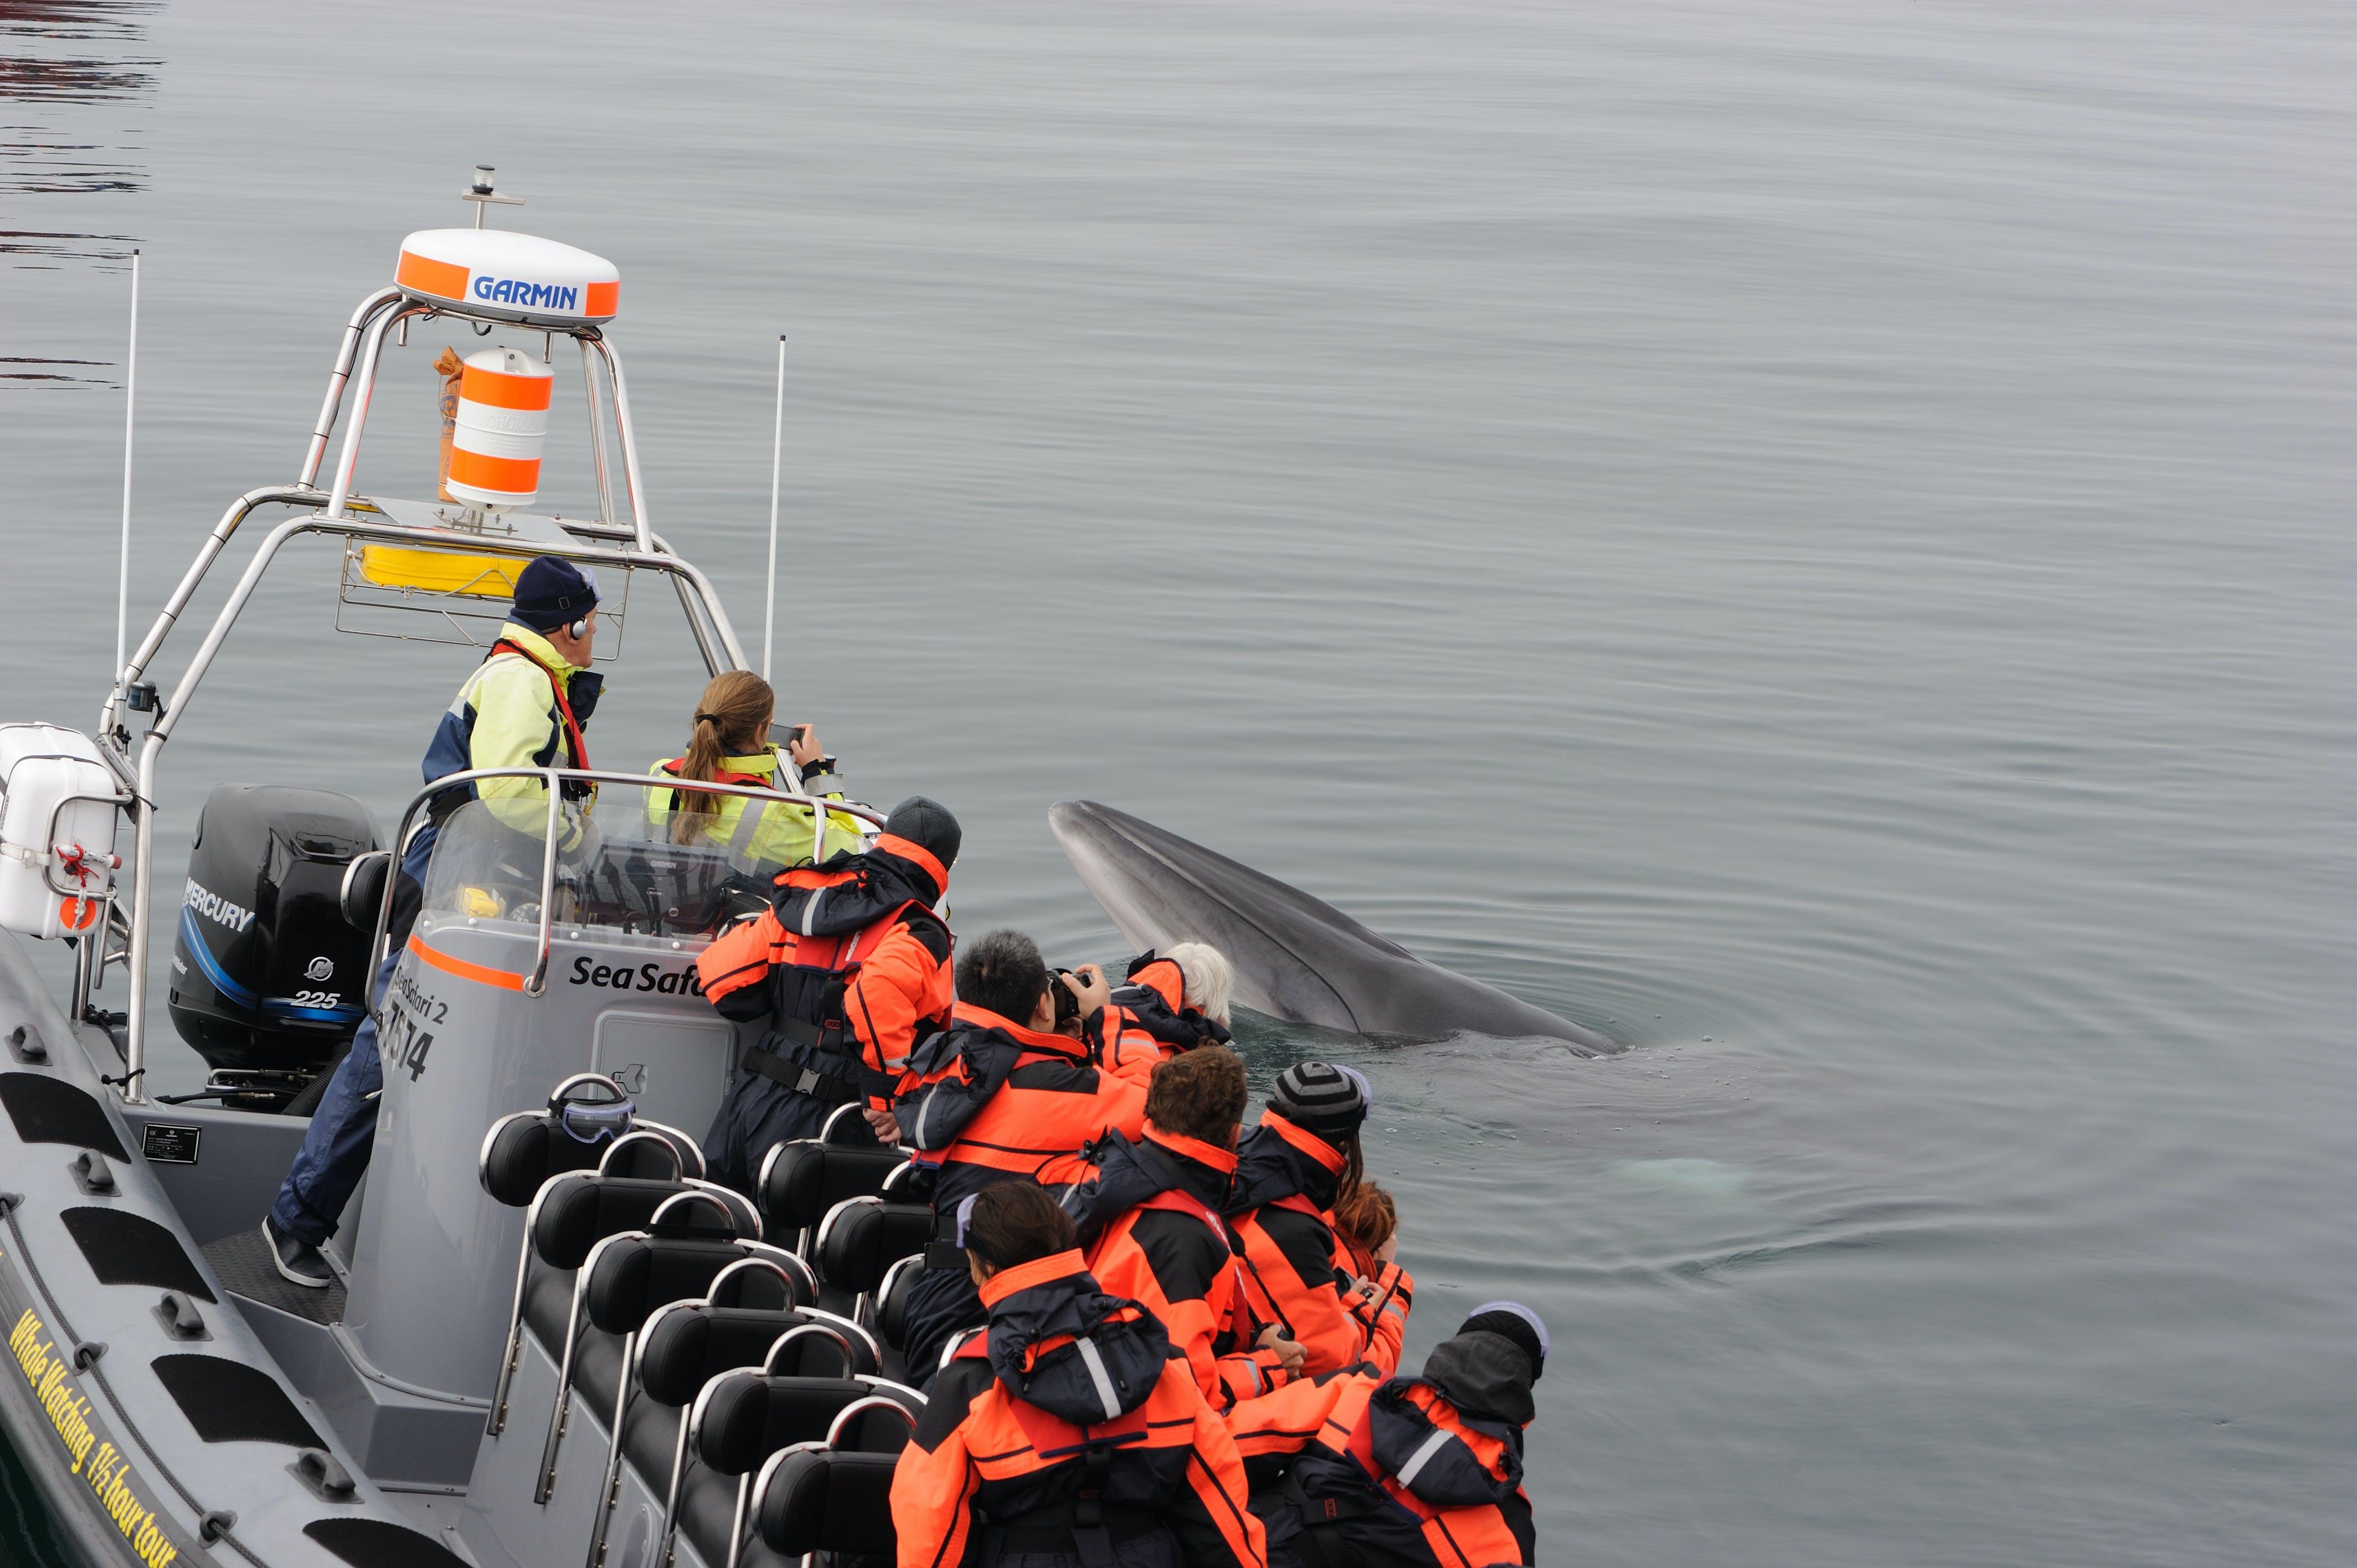 Sortie baleines et macareux en zodiac au large de Reykjavik